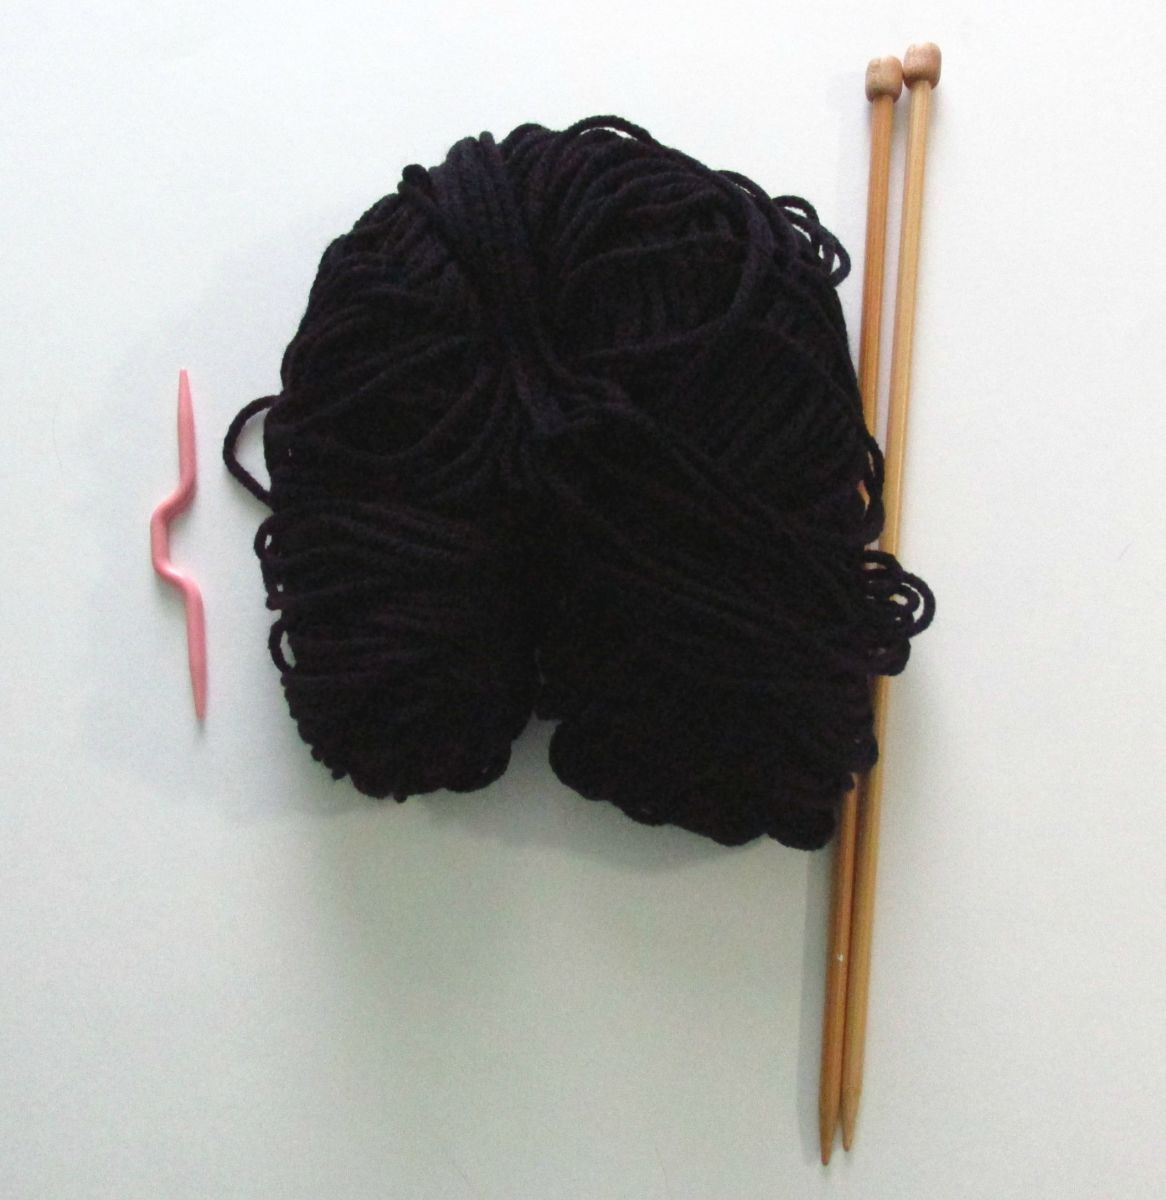 Knitting Needle, Worsted Weight Yarn &  Cable Needle